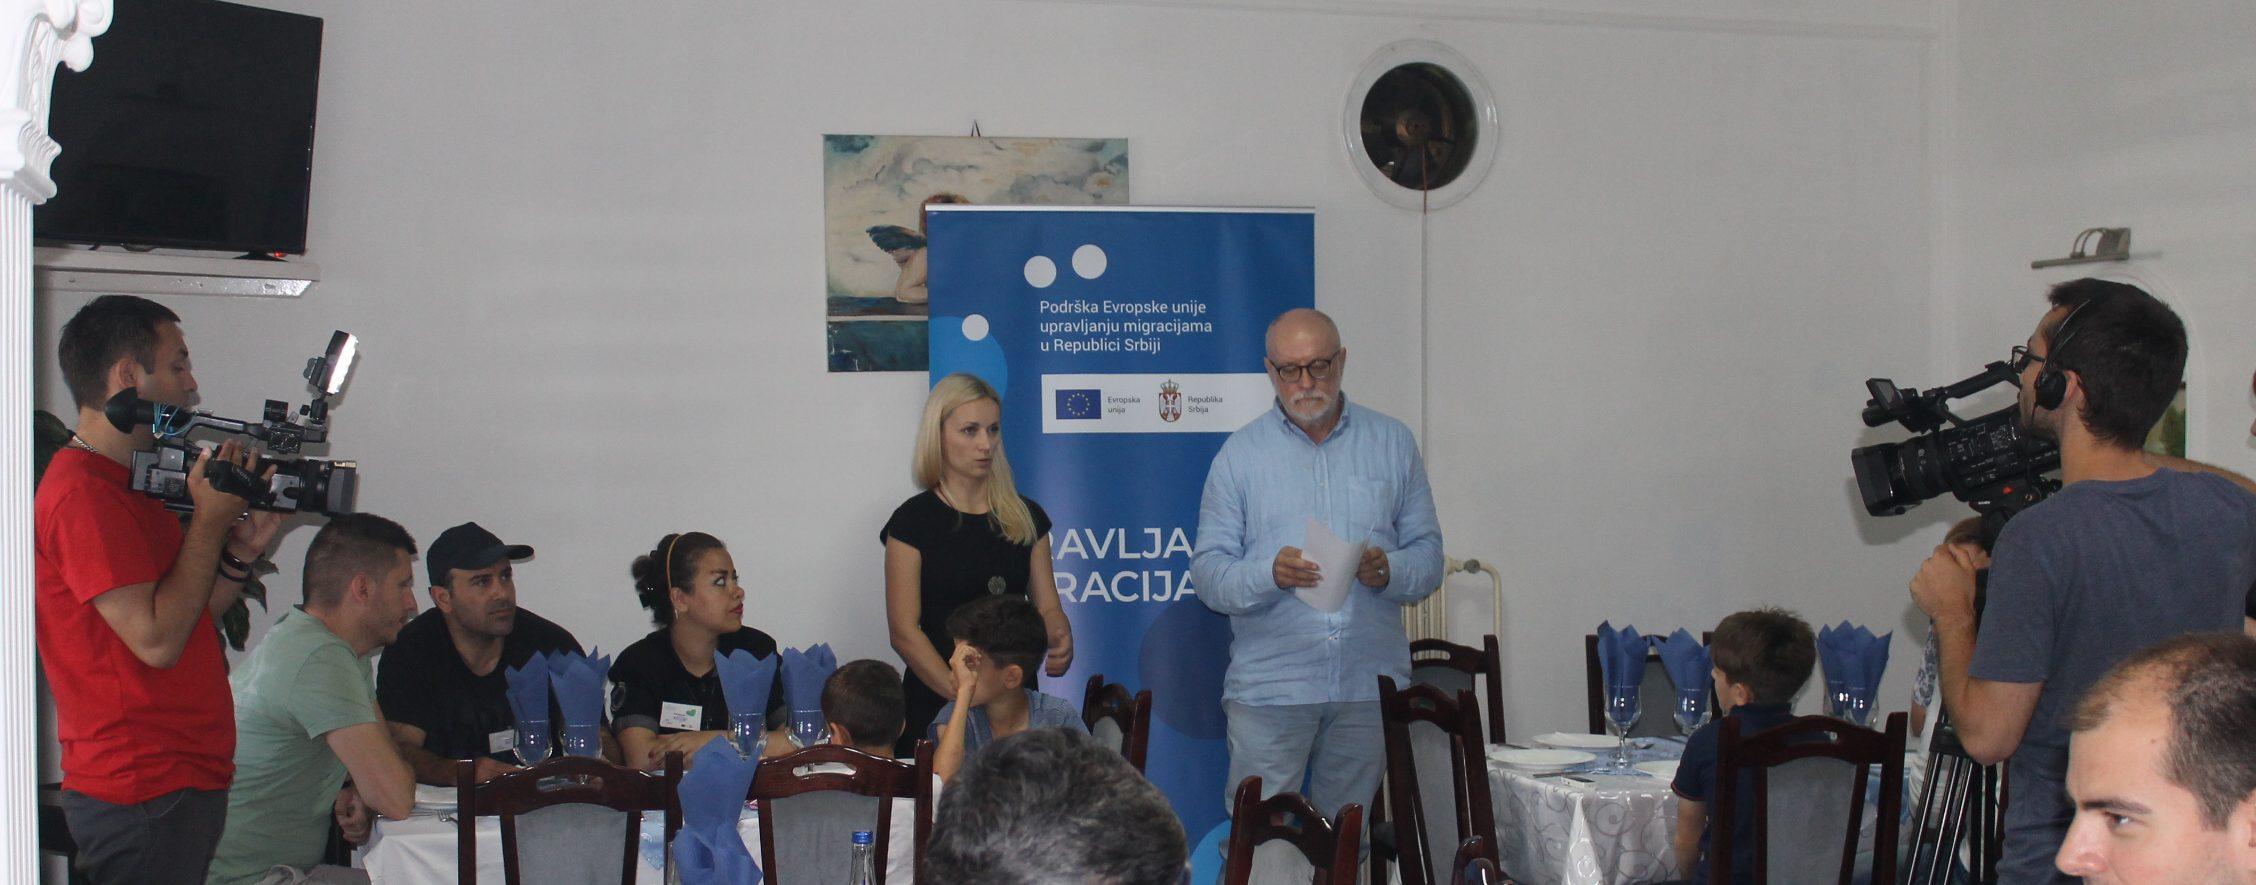 "Activities under the slogan ''Celebrating diversity"" presented in Šid"